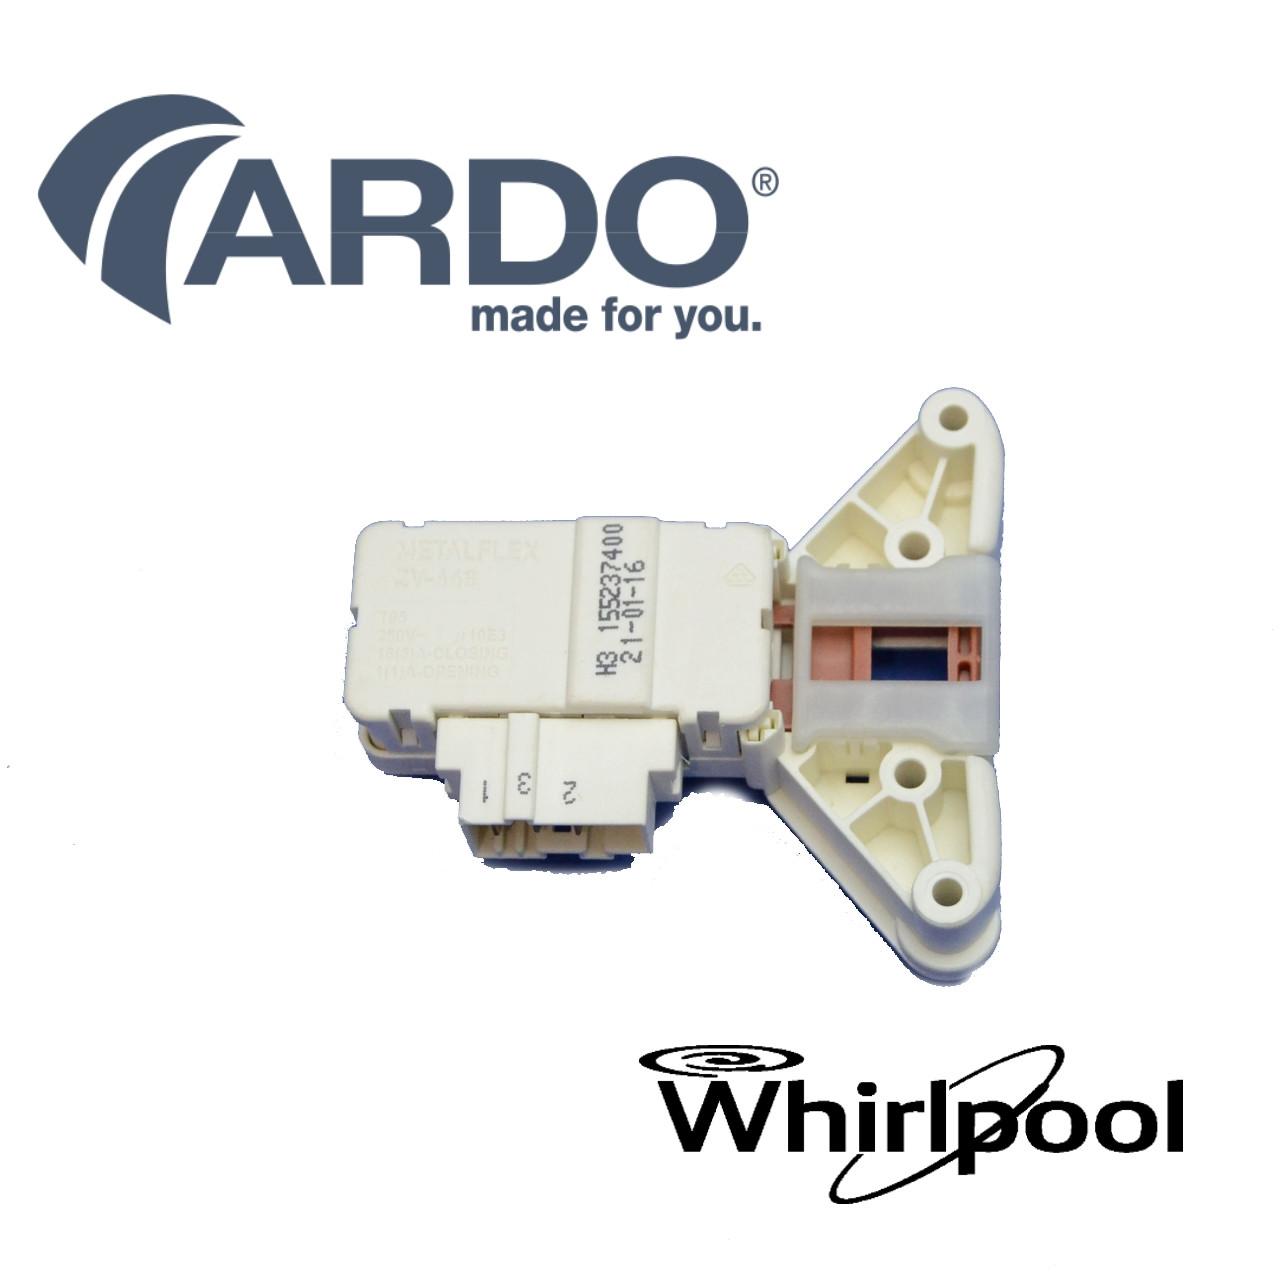 Замок люка для пральних машин Ardo, Whirlpool з вушками (Metalflex ZV-446 H1 / H2 / H3) - 530001501 / 6510167